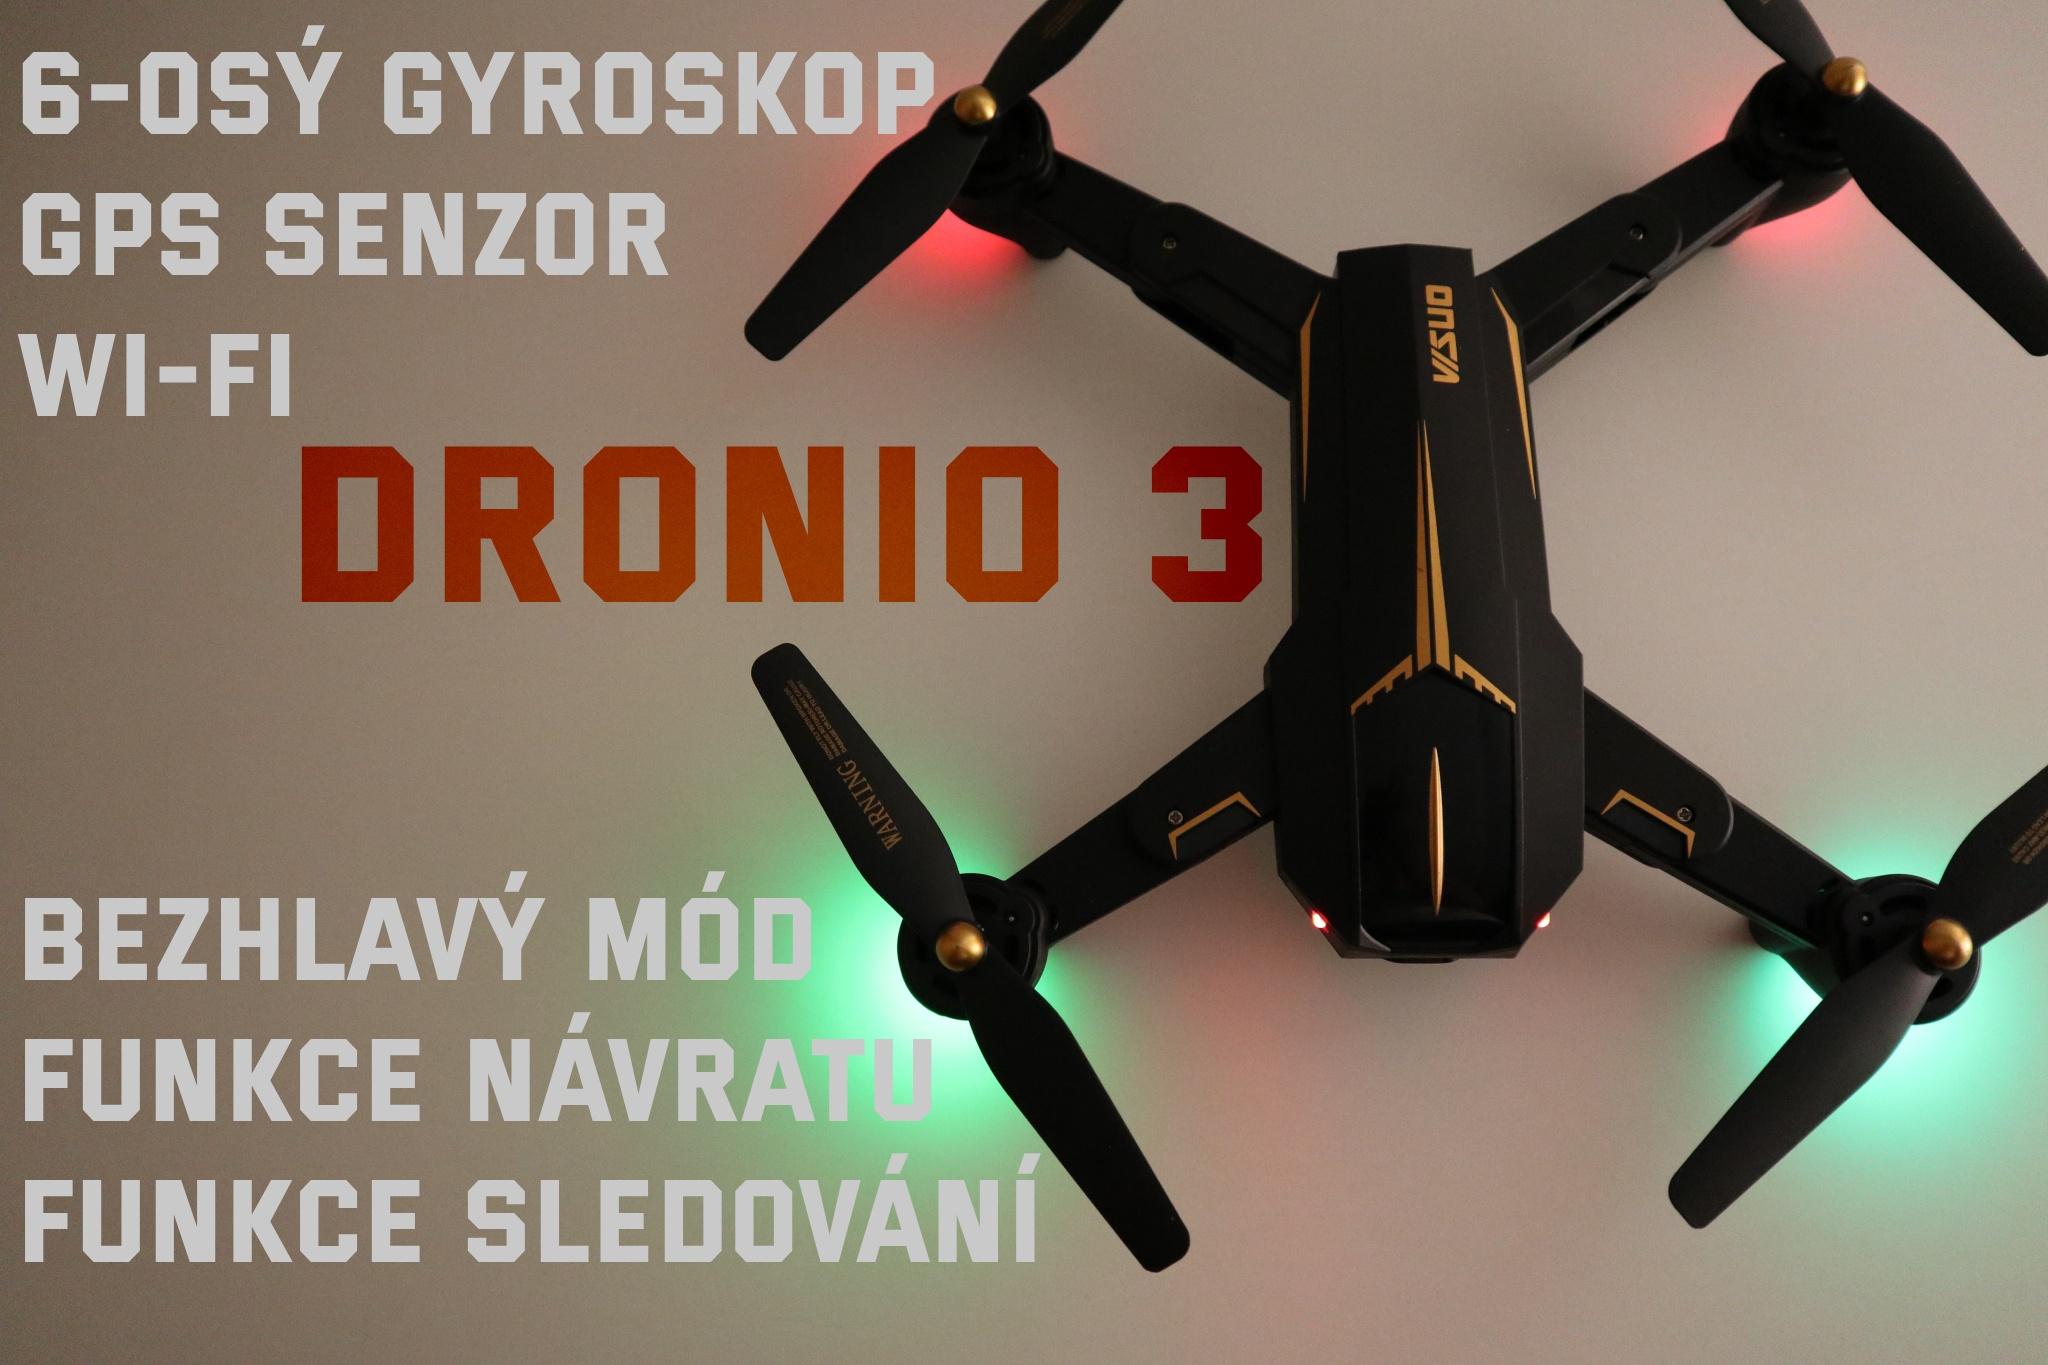 Dronio3 funkce